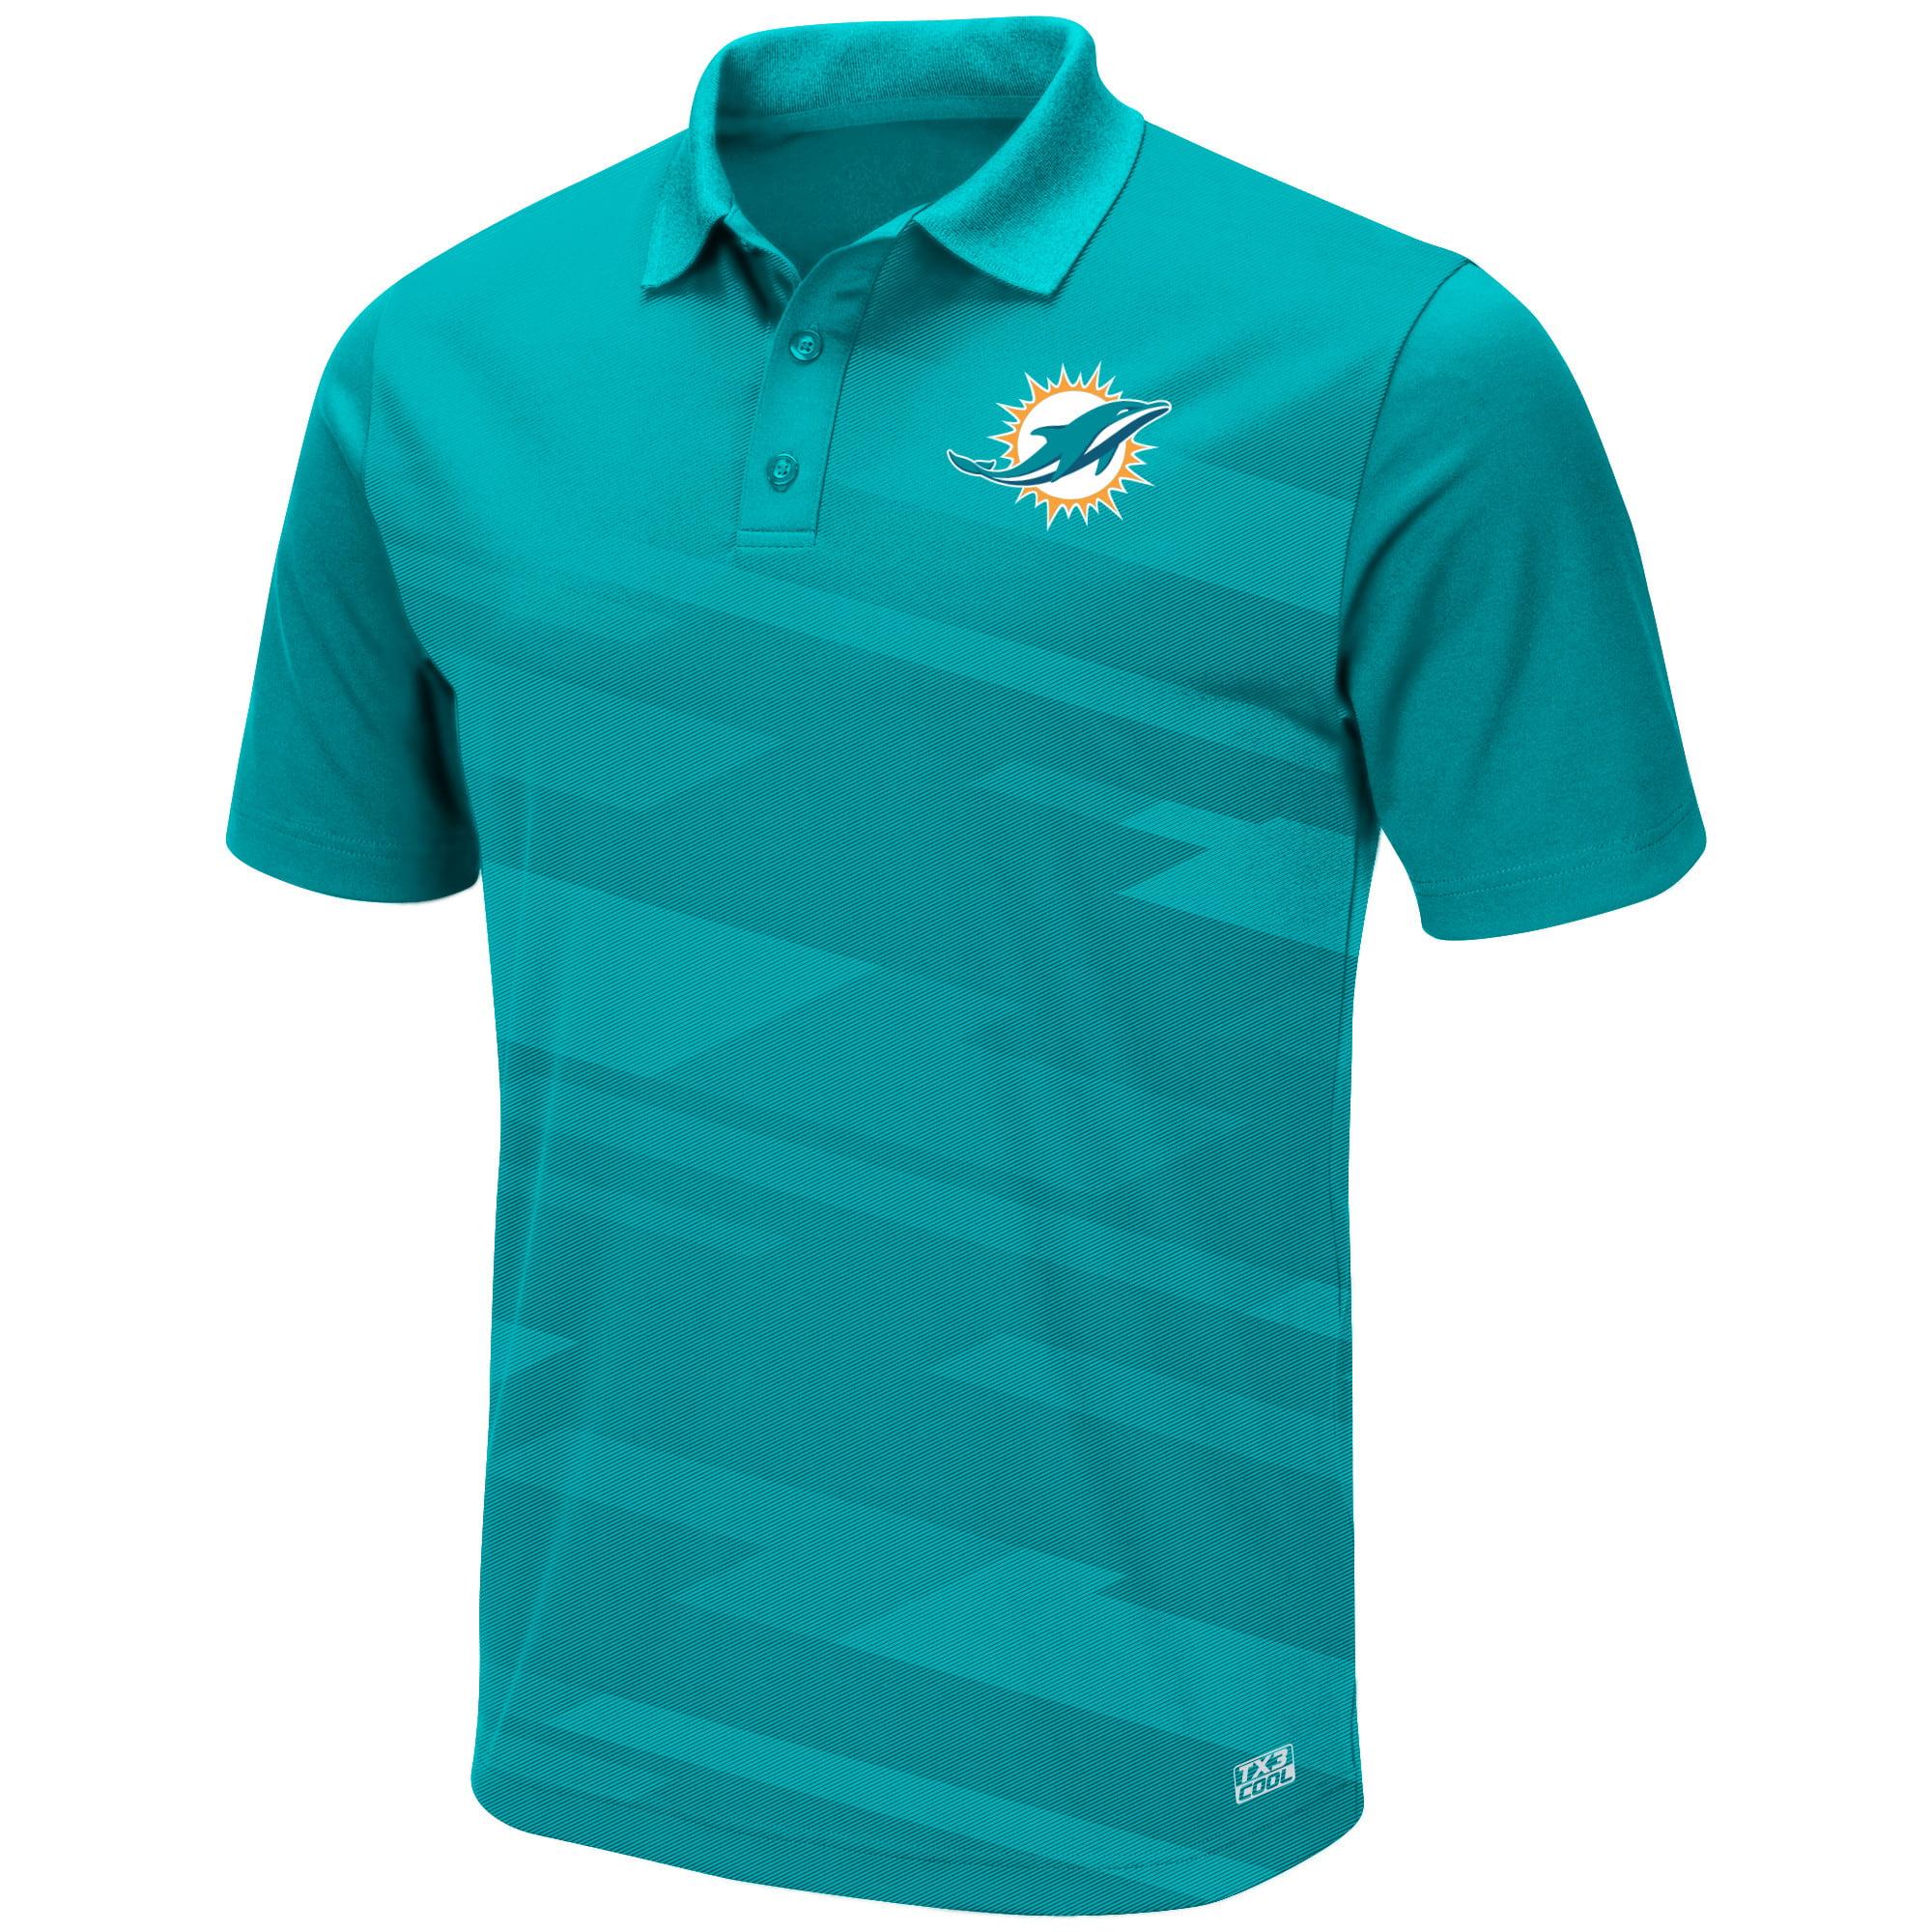 Men's Majestic Aqua Miami Dolphins Big Hit TX3 Polo